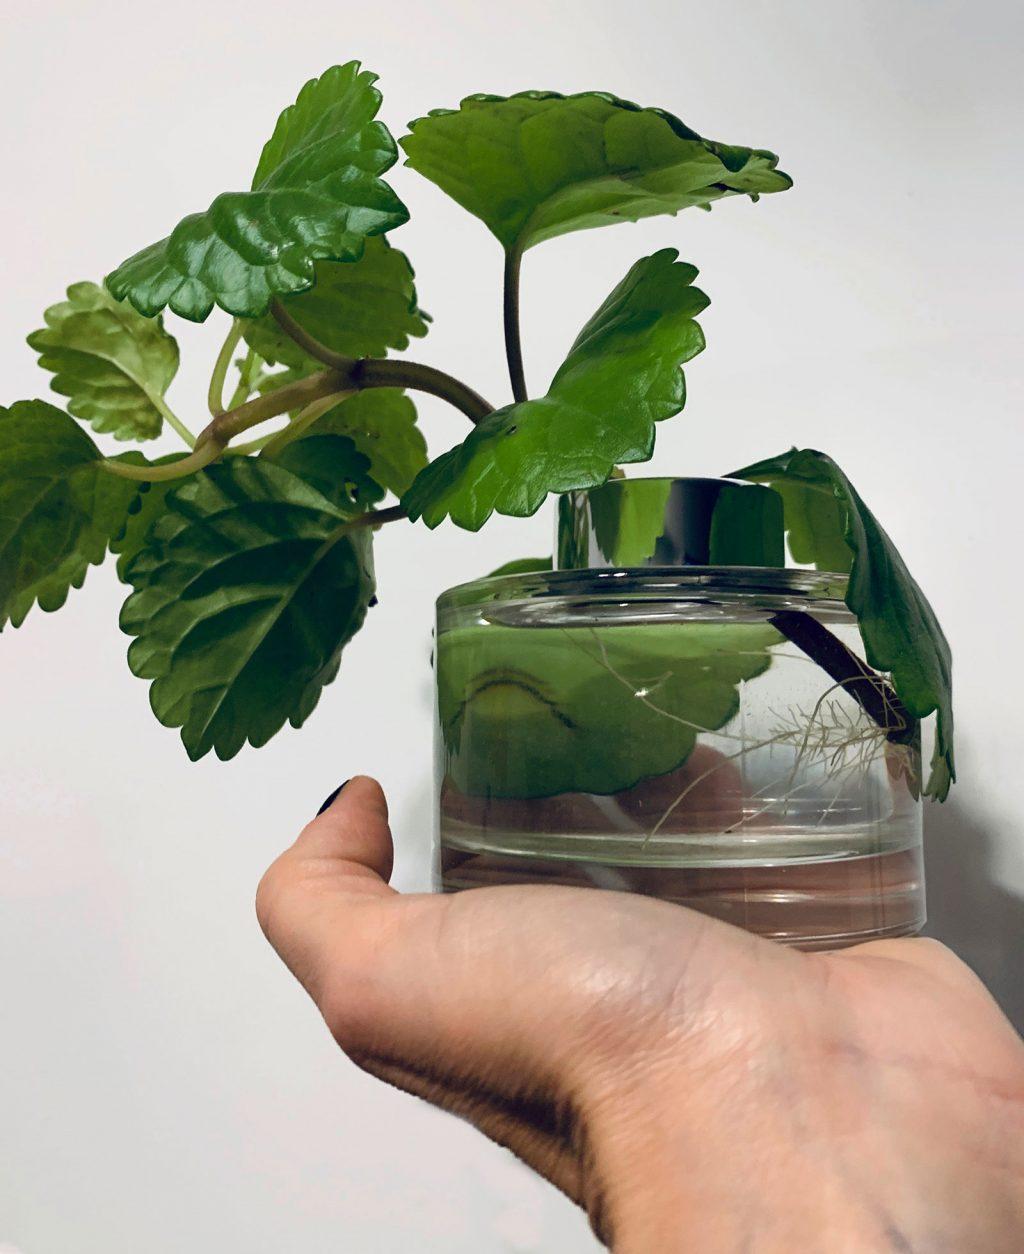 Plectranthus verticillatus et ses belles racines - La Revue Vertu